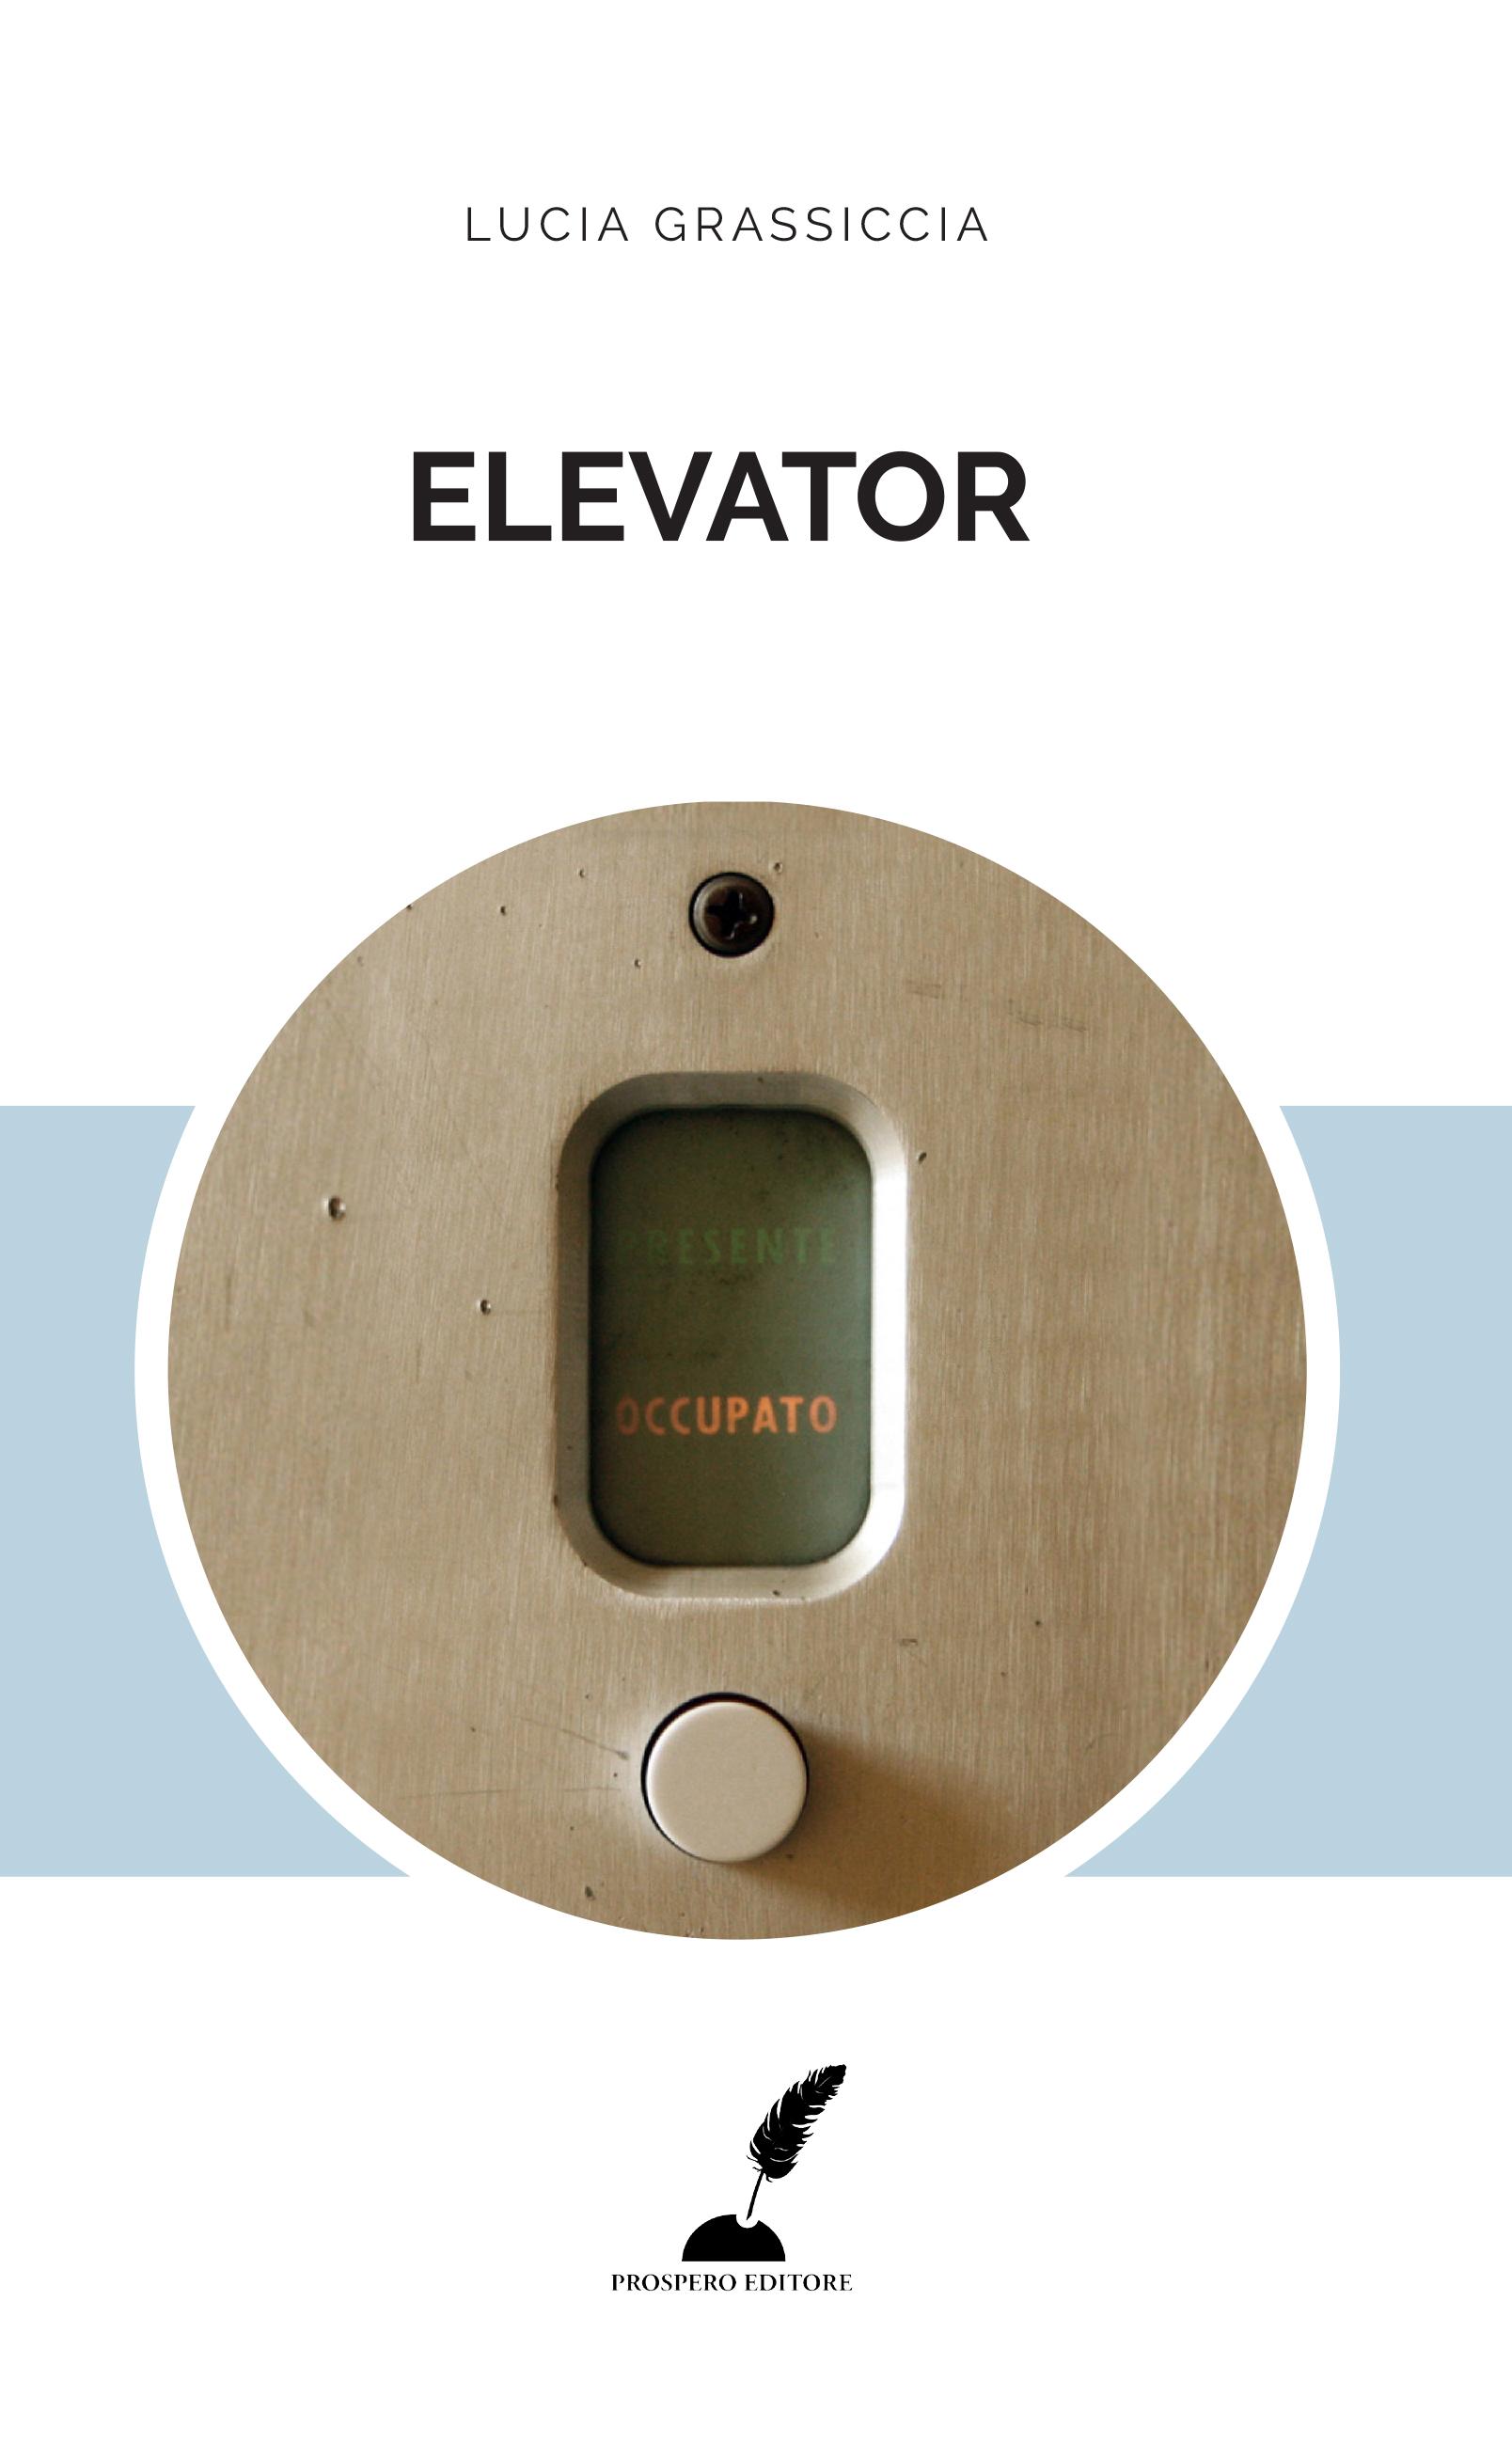 Elevator-image